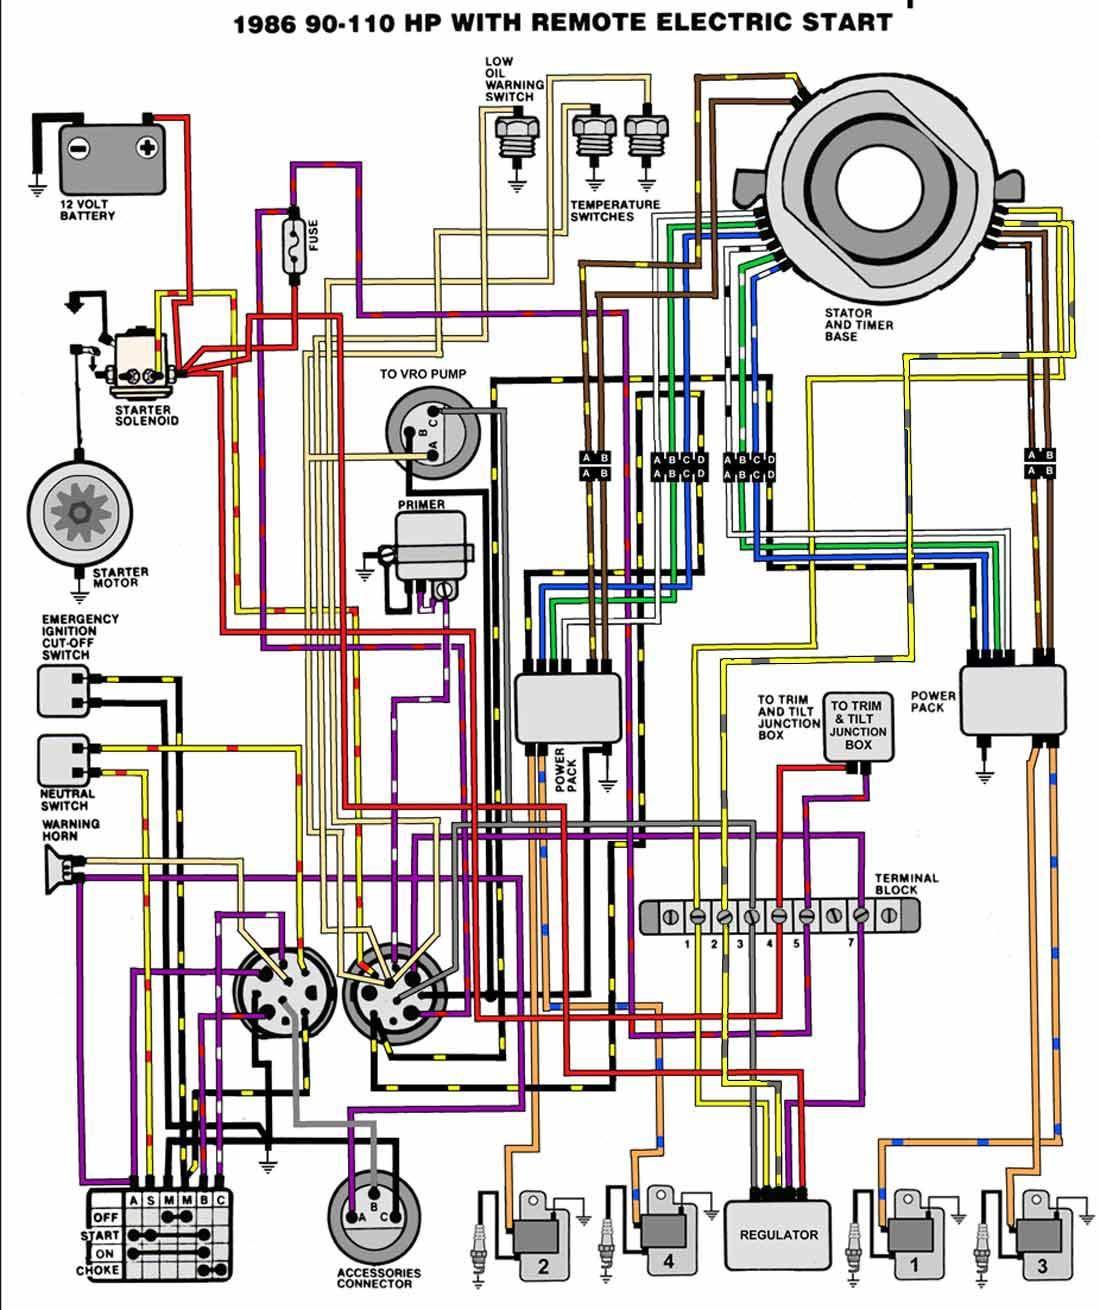 RG_5735] Evinrude 28 Spl Ignition Wiring Diagram Download DiagramLexor Sand Ophag Greas Benkeme Mohammedshrine Librar Wiring 101